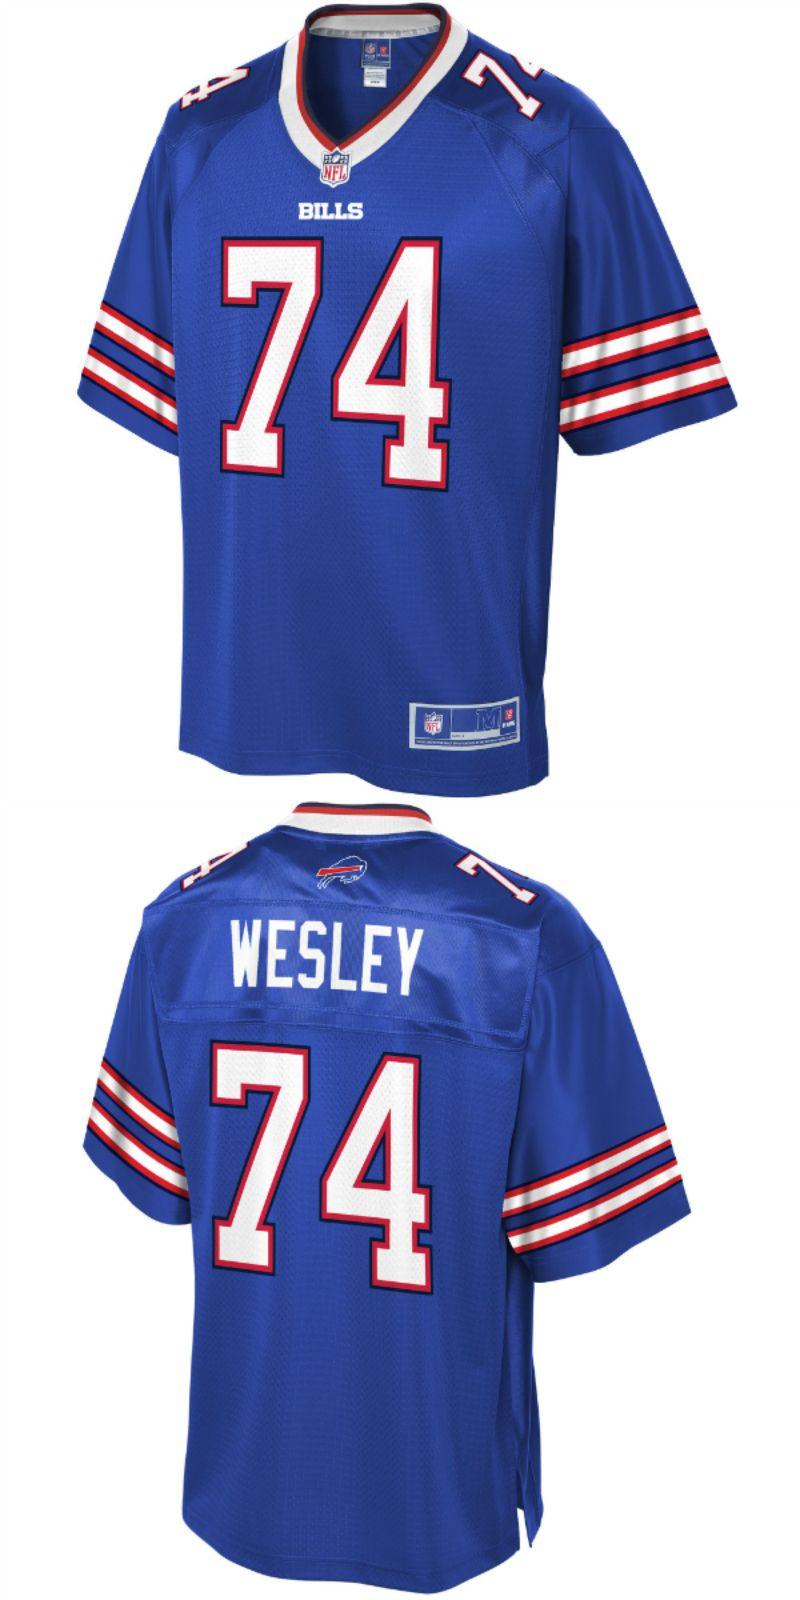 premium selection 531b3 088fa Deon Lacey Buffalo Bills NFL Pro Line Team Color Player ...